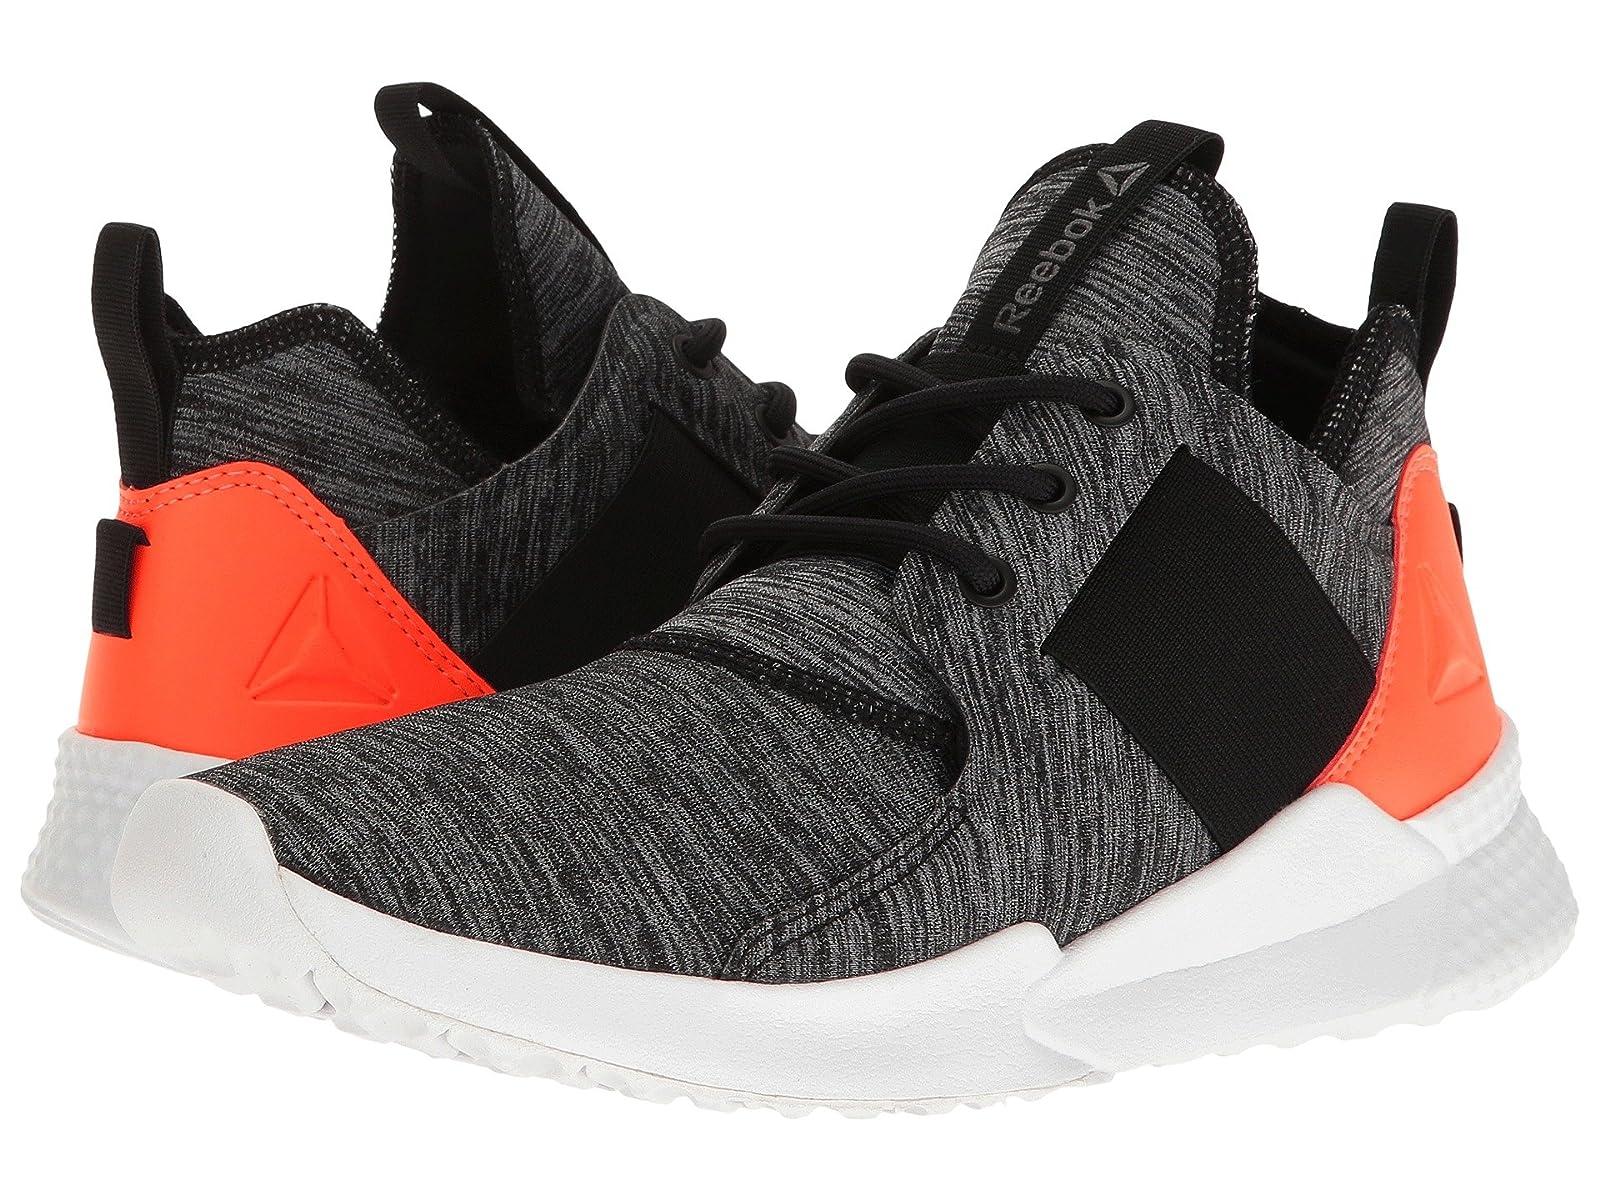 Reebok Pilox 1.0Cheap and distinctive eye-catching shoes